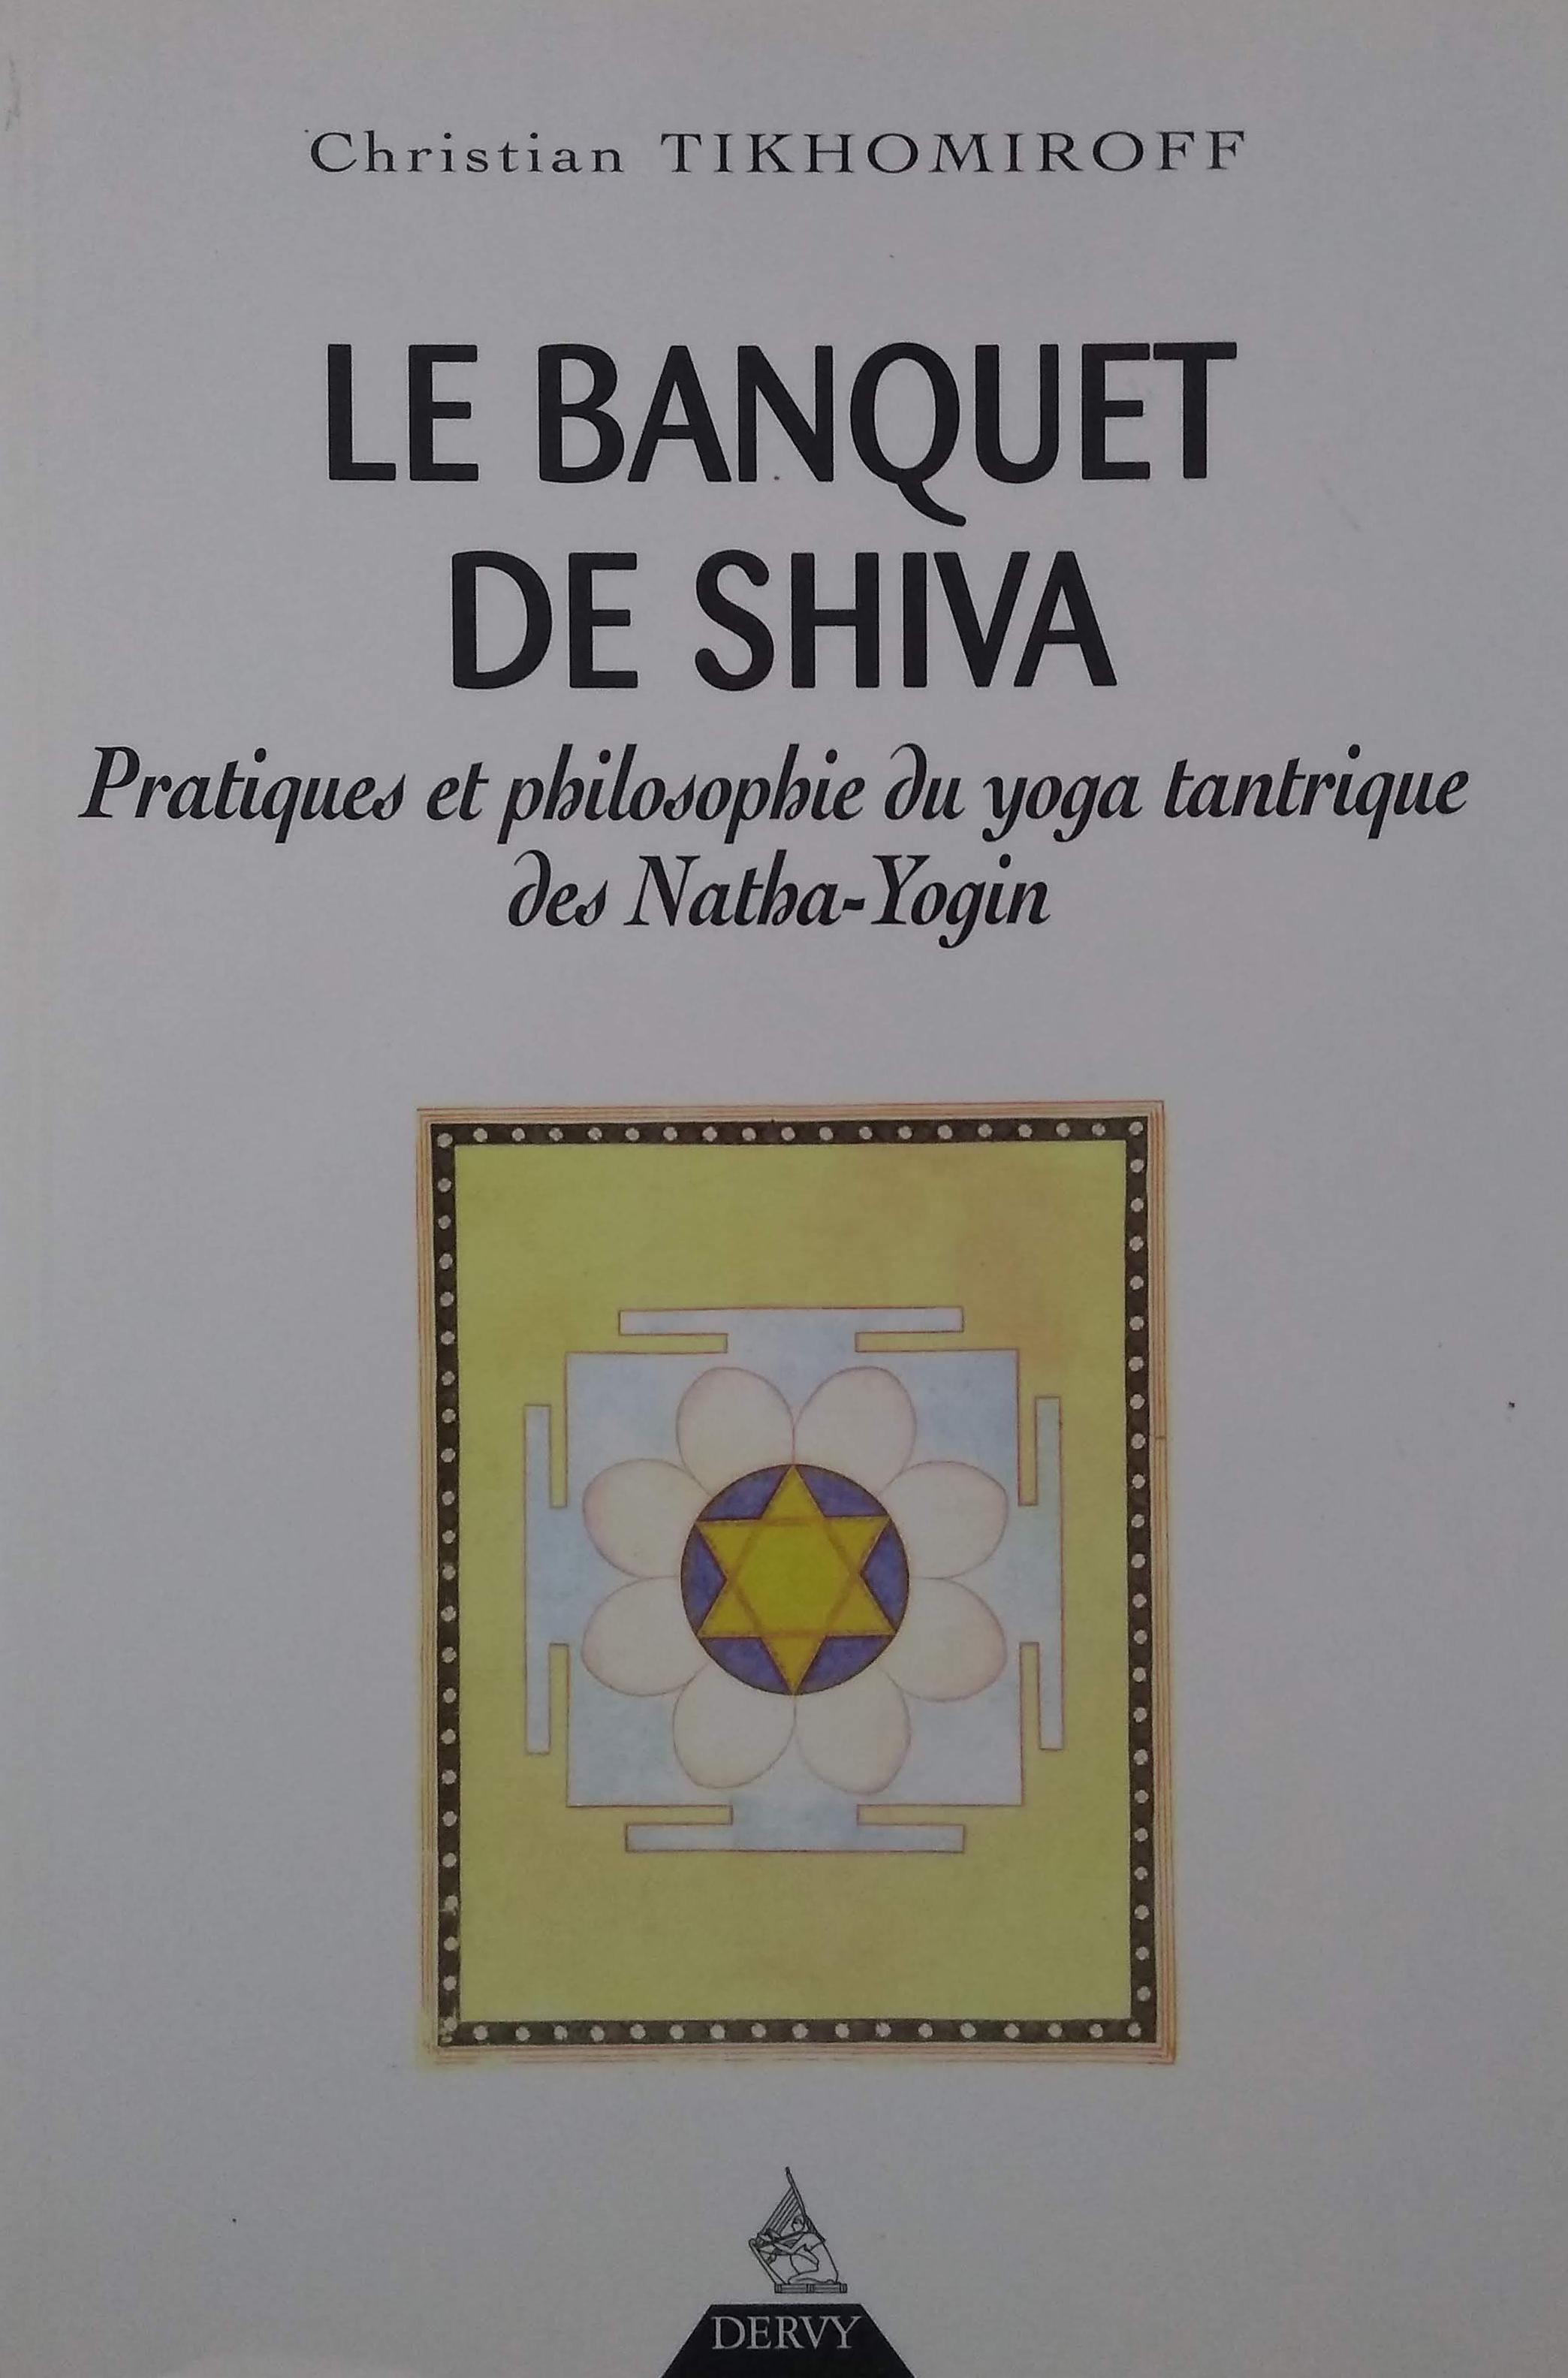 Le Banquet de Shiva